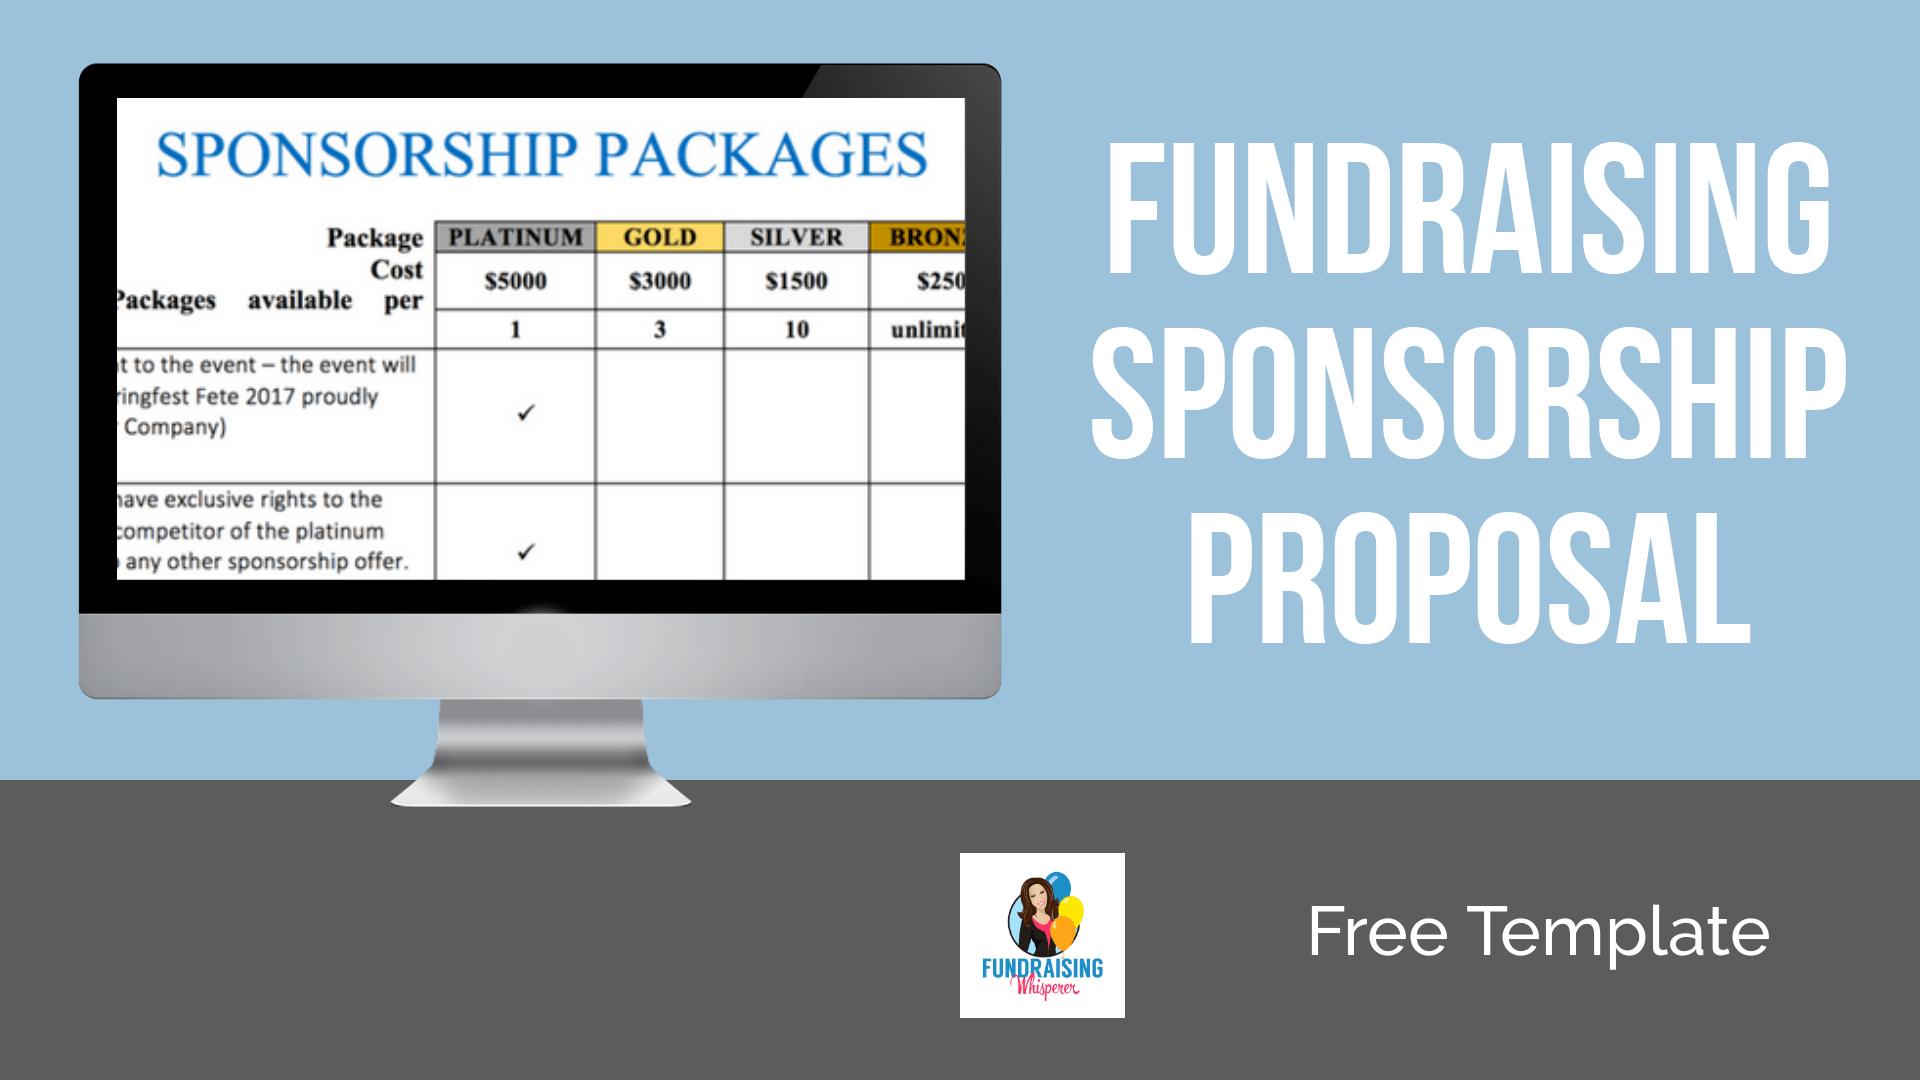 Fundraising sponsorship proposal template free maxwellsz